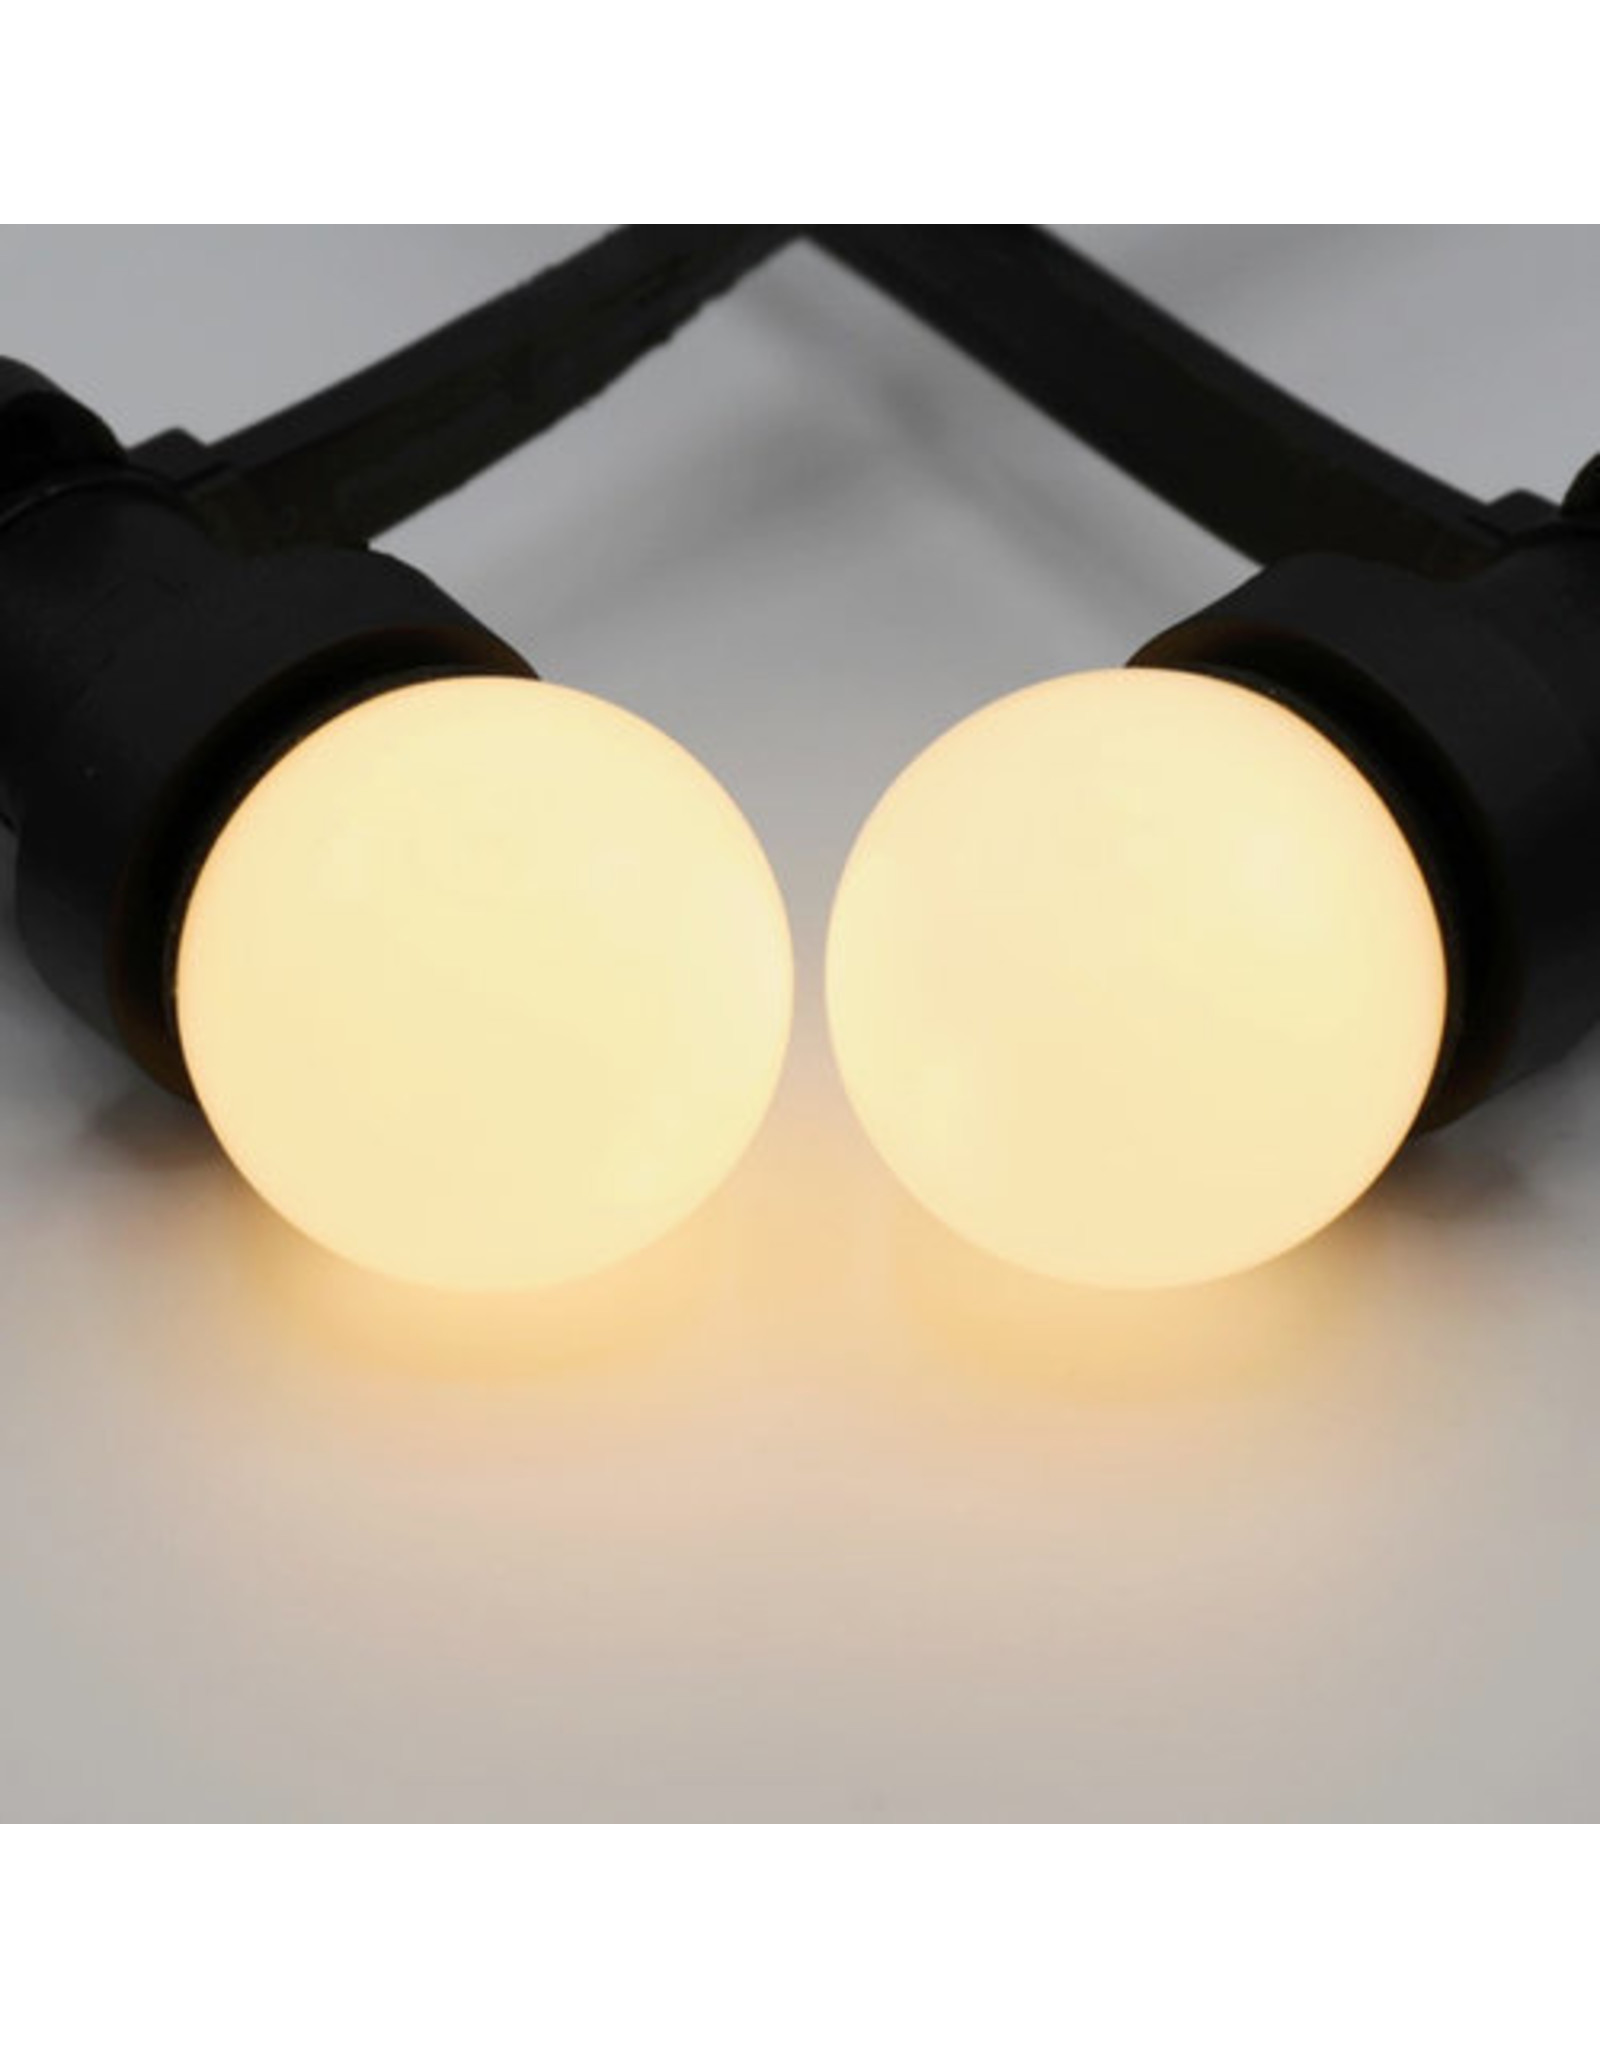 Lights guirlande Warm witte LED lampen met melkkap - 1,5 watt, 2650K (gloeilamp)